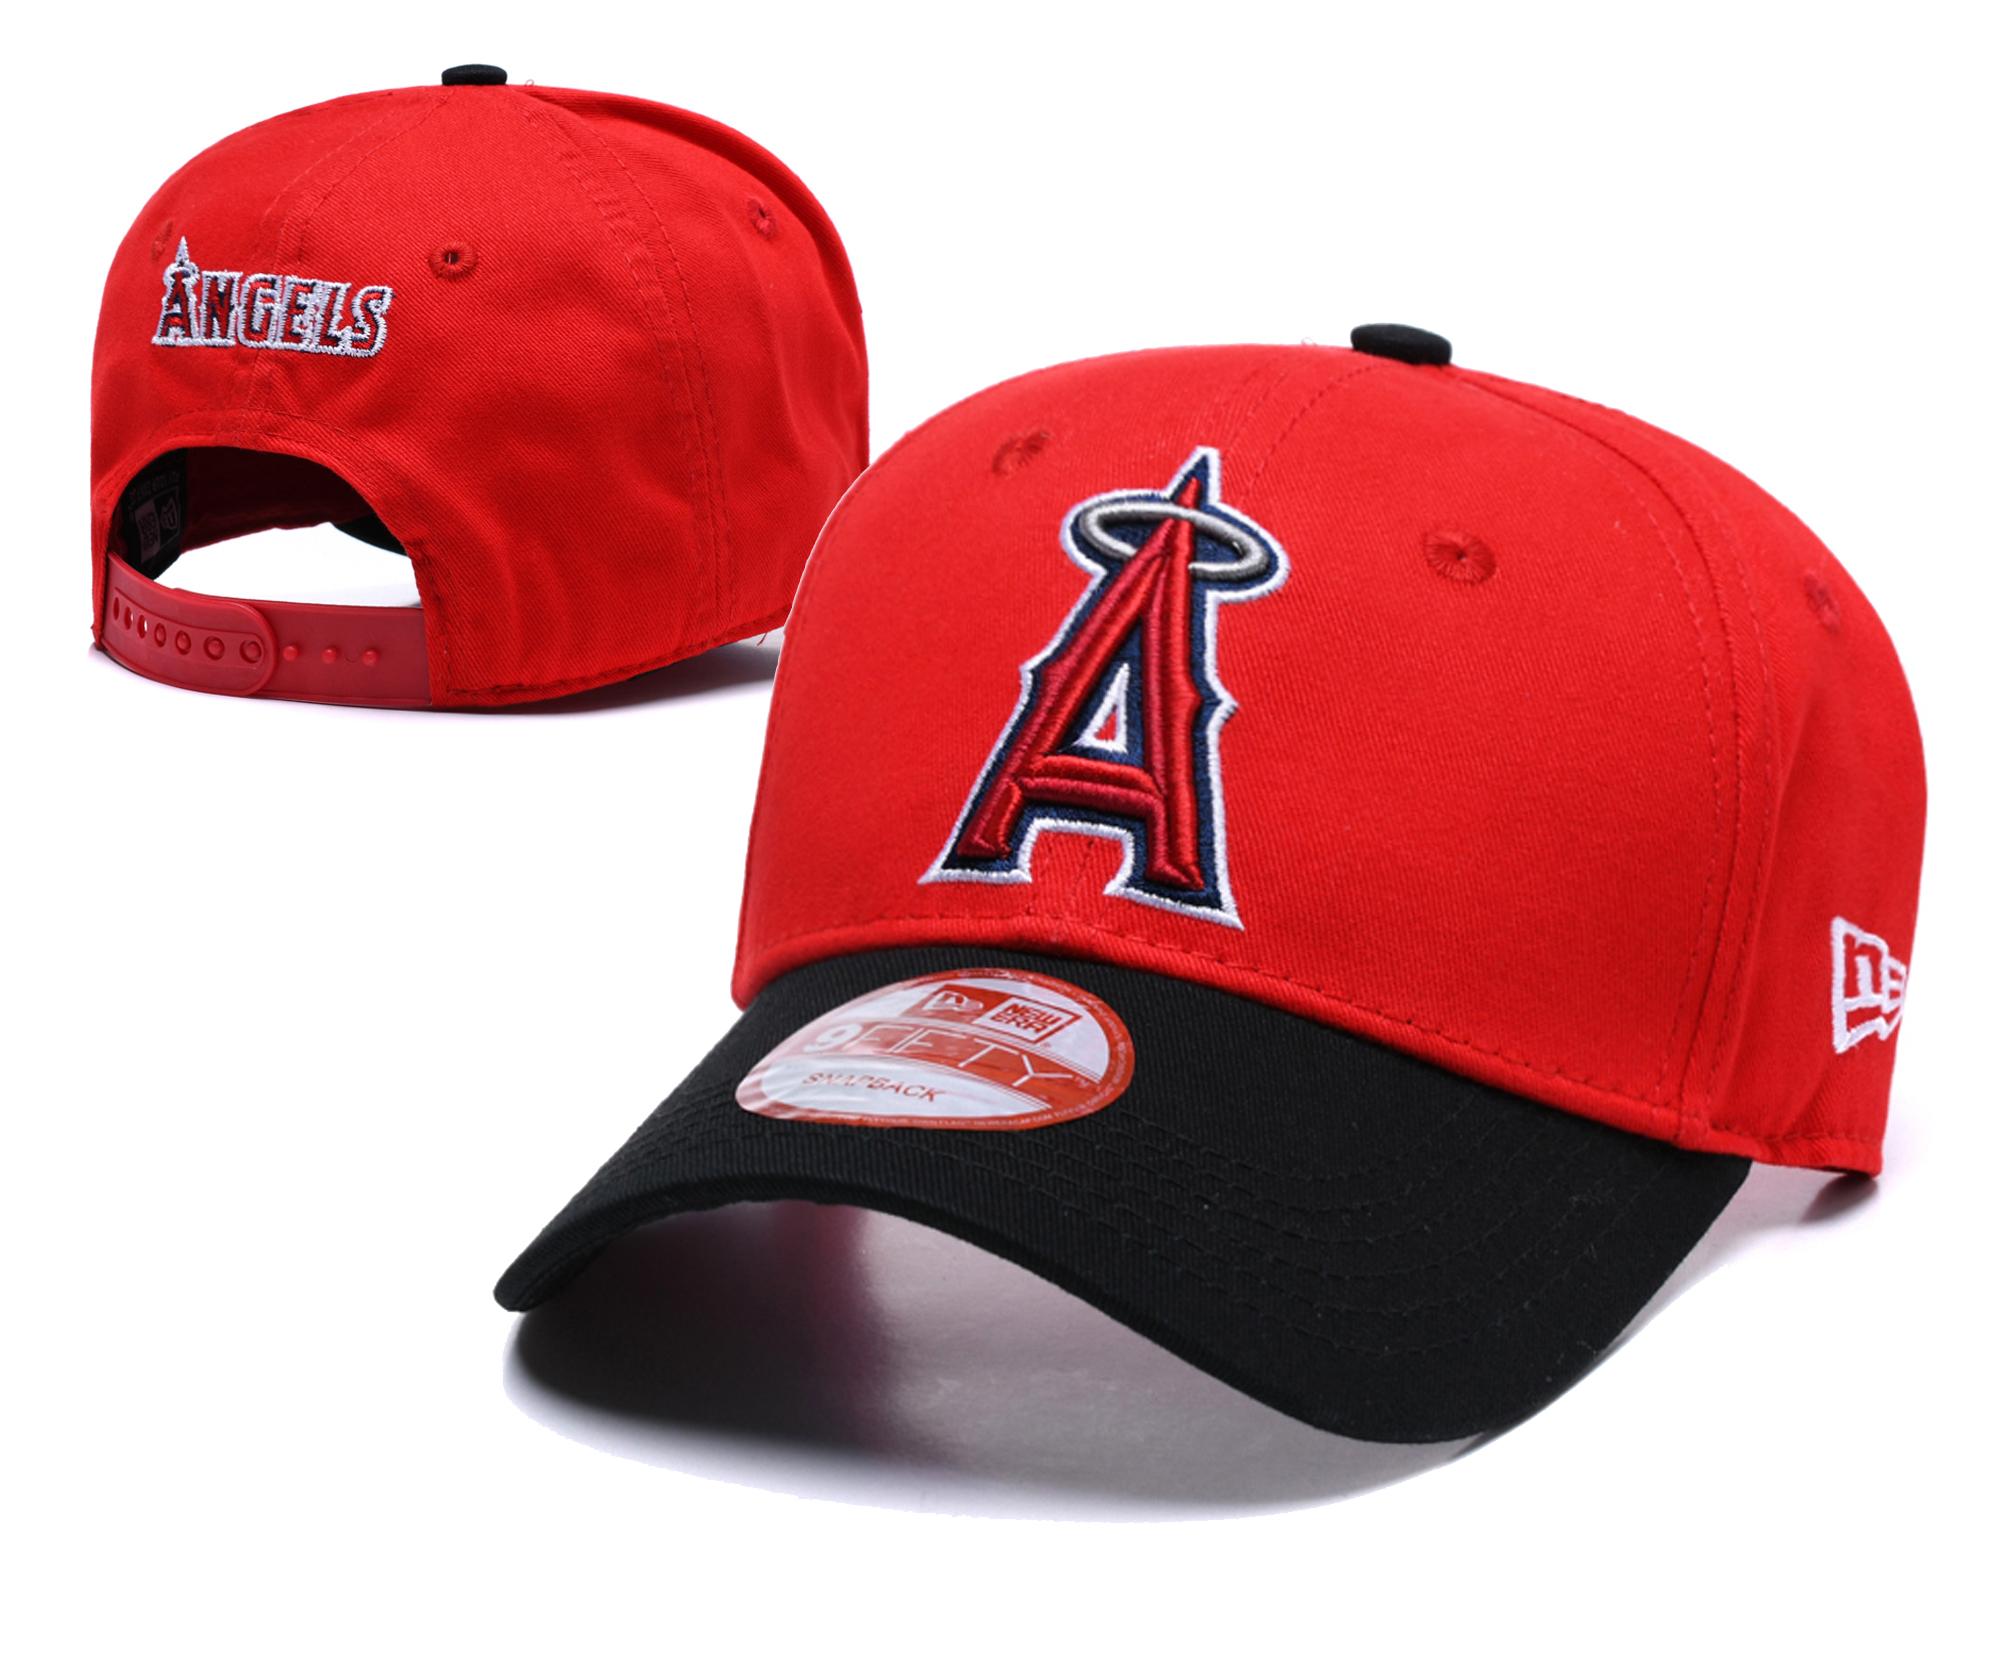 Angels Fresh Logo Red Adjustable Hat TX